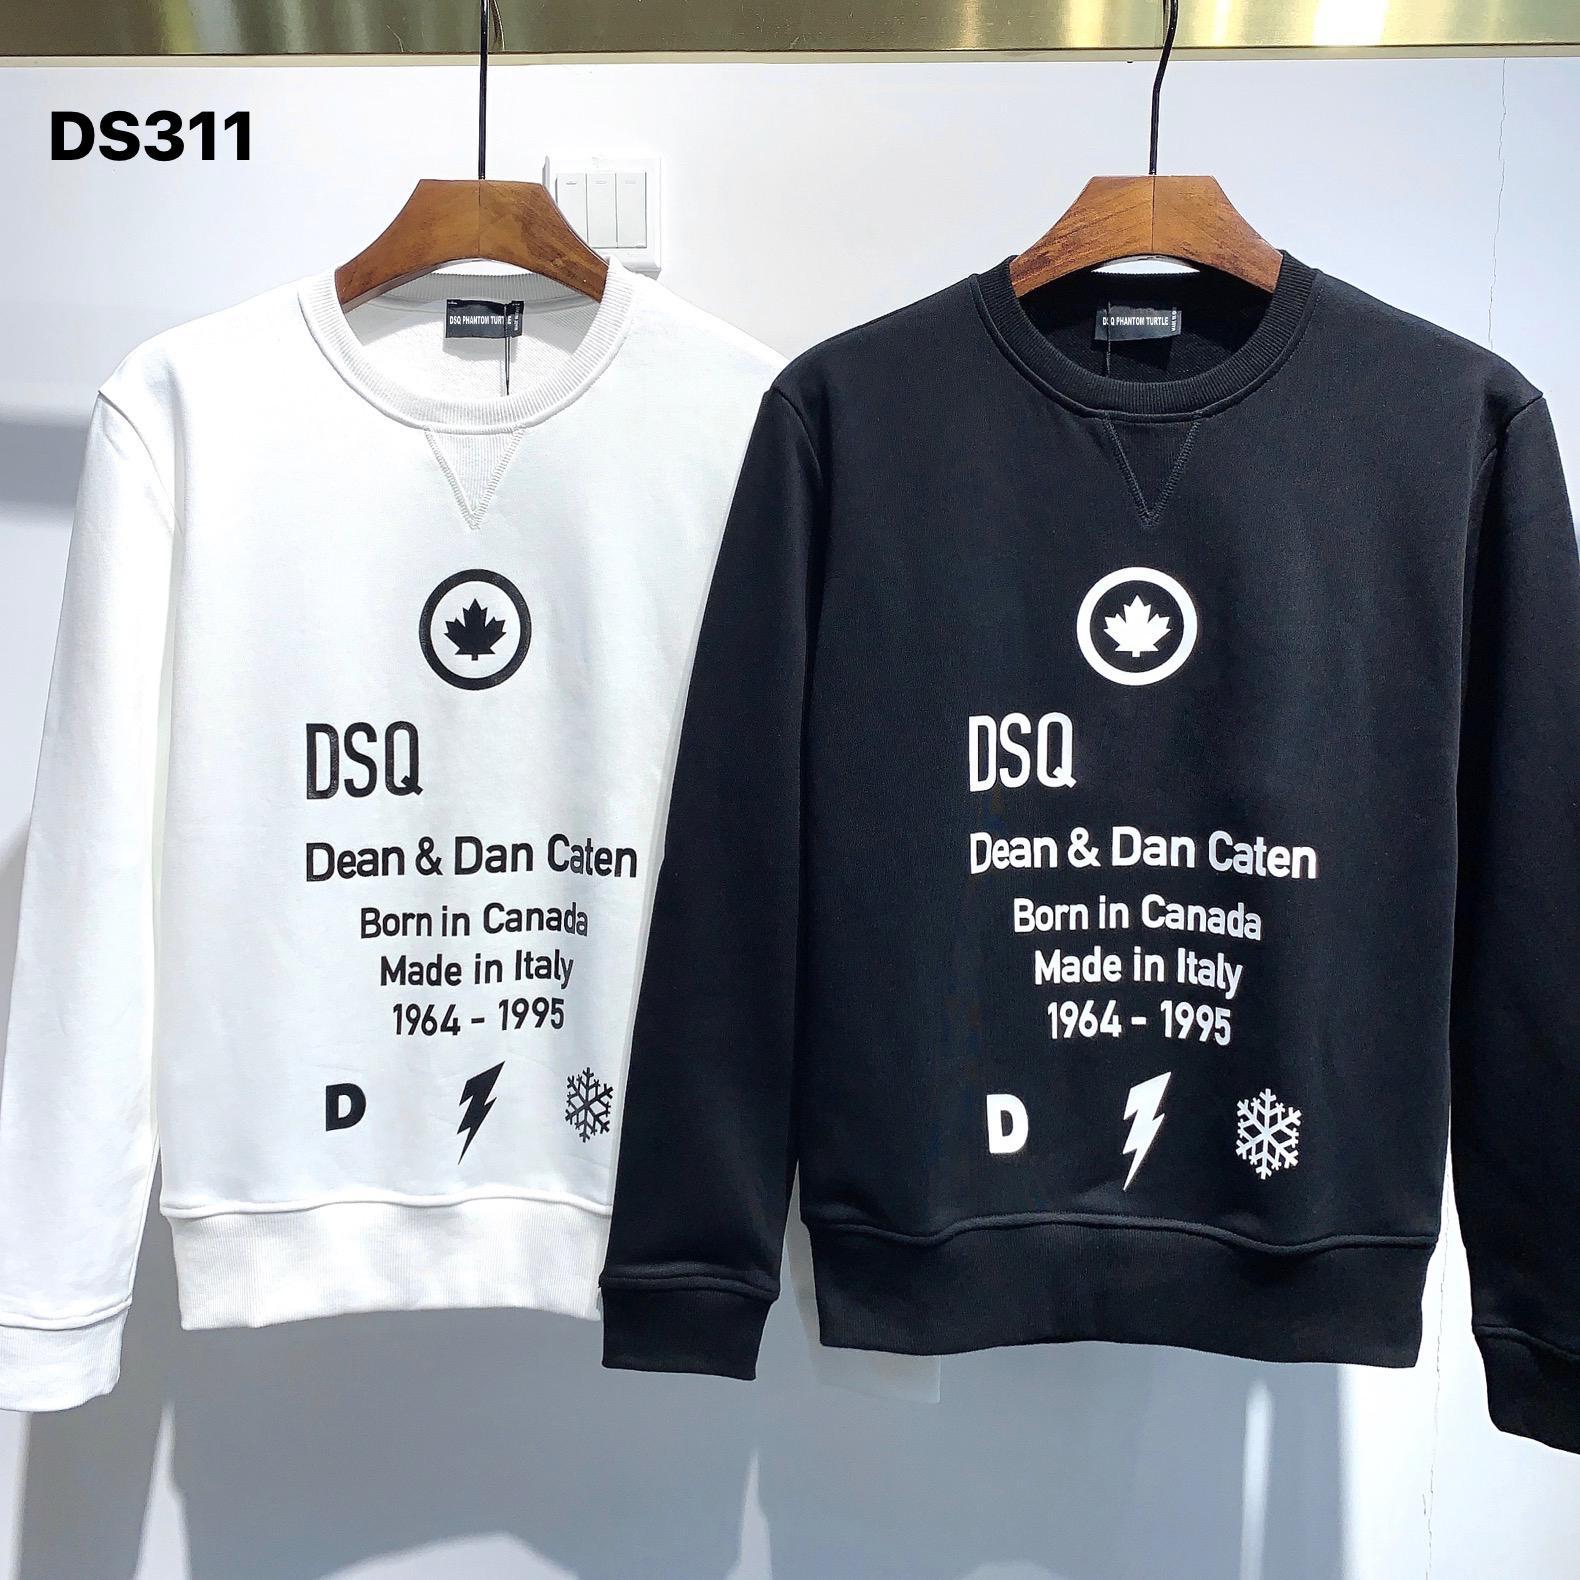 DSQ Phantom Turtle Hoody New Herren Designer Hoodies Italien Mode Sweatshirts Herbst Druck DSQ Hoodie Männliche Top Qualität 100% Baumwolle Tops 01256